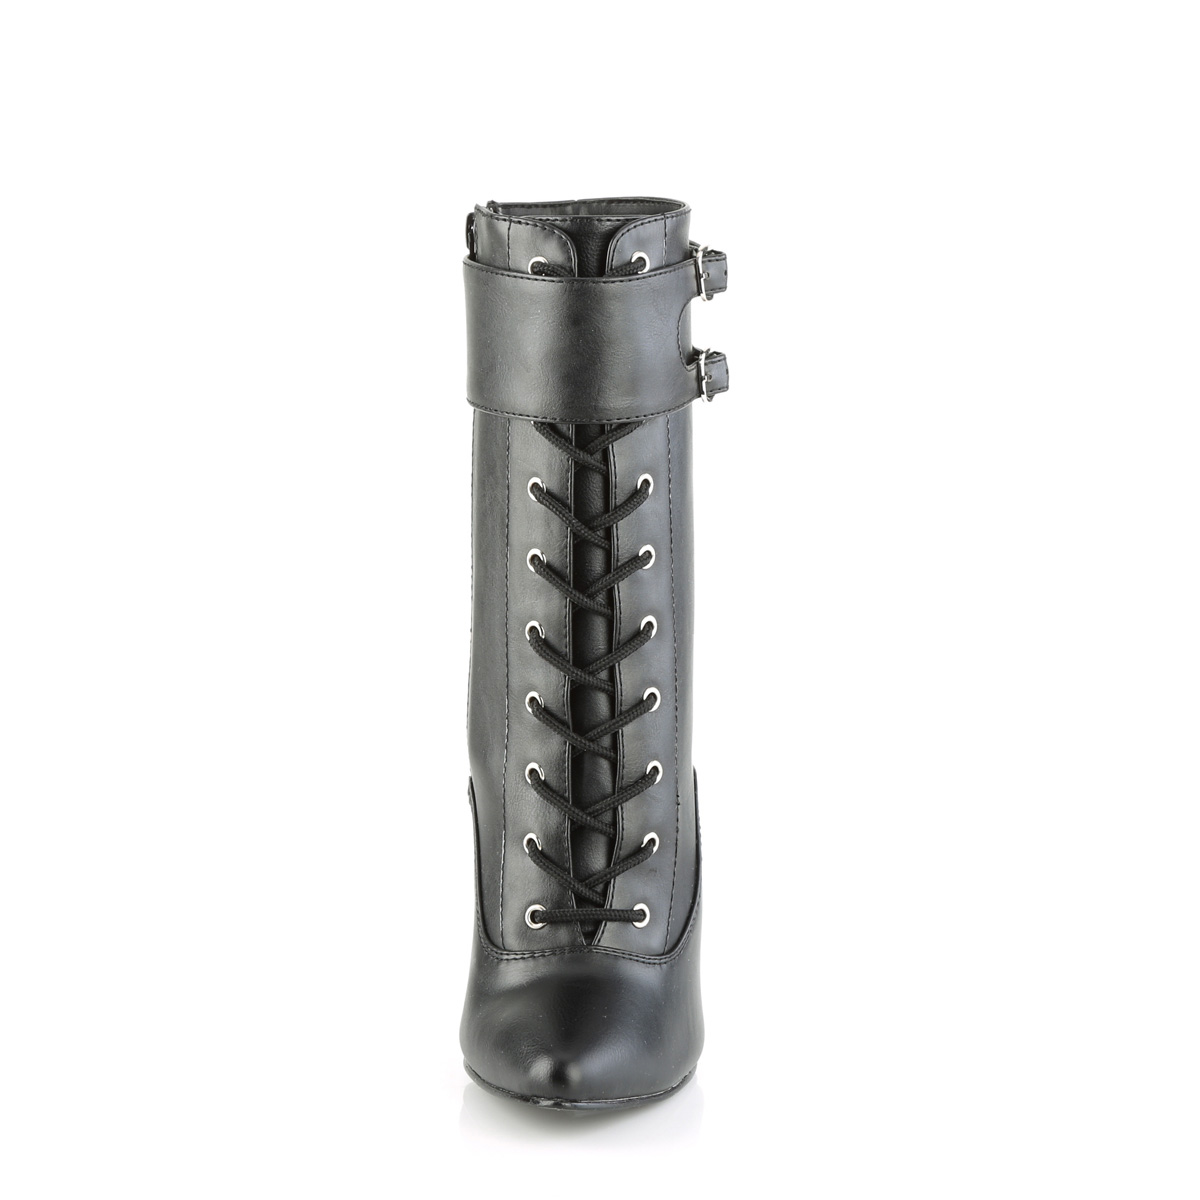 DEVIOUS(Pleaser) DOMINA-1023 ショートブーツ つや消し黒 交換可能な3種類のアンクルカフ付き プリーザー 約15cmハイヒール◆取り寄せ